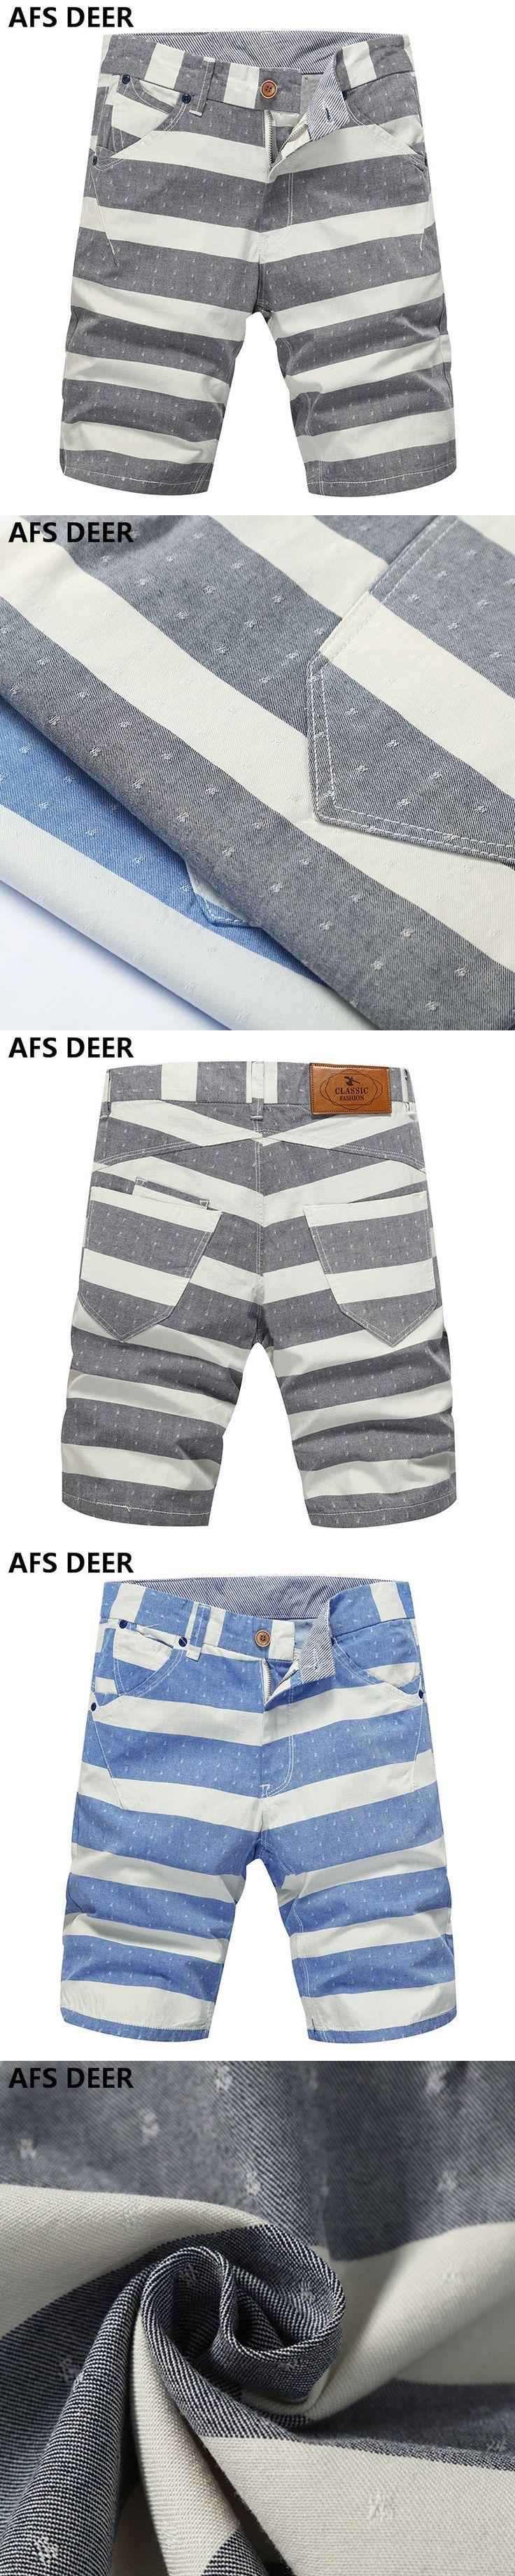 High Quality Mens Shorts  Board Shorts Summer causal Beach Bermuda Short Pants stripped male shorts Boardshorts Big Size